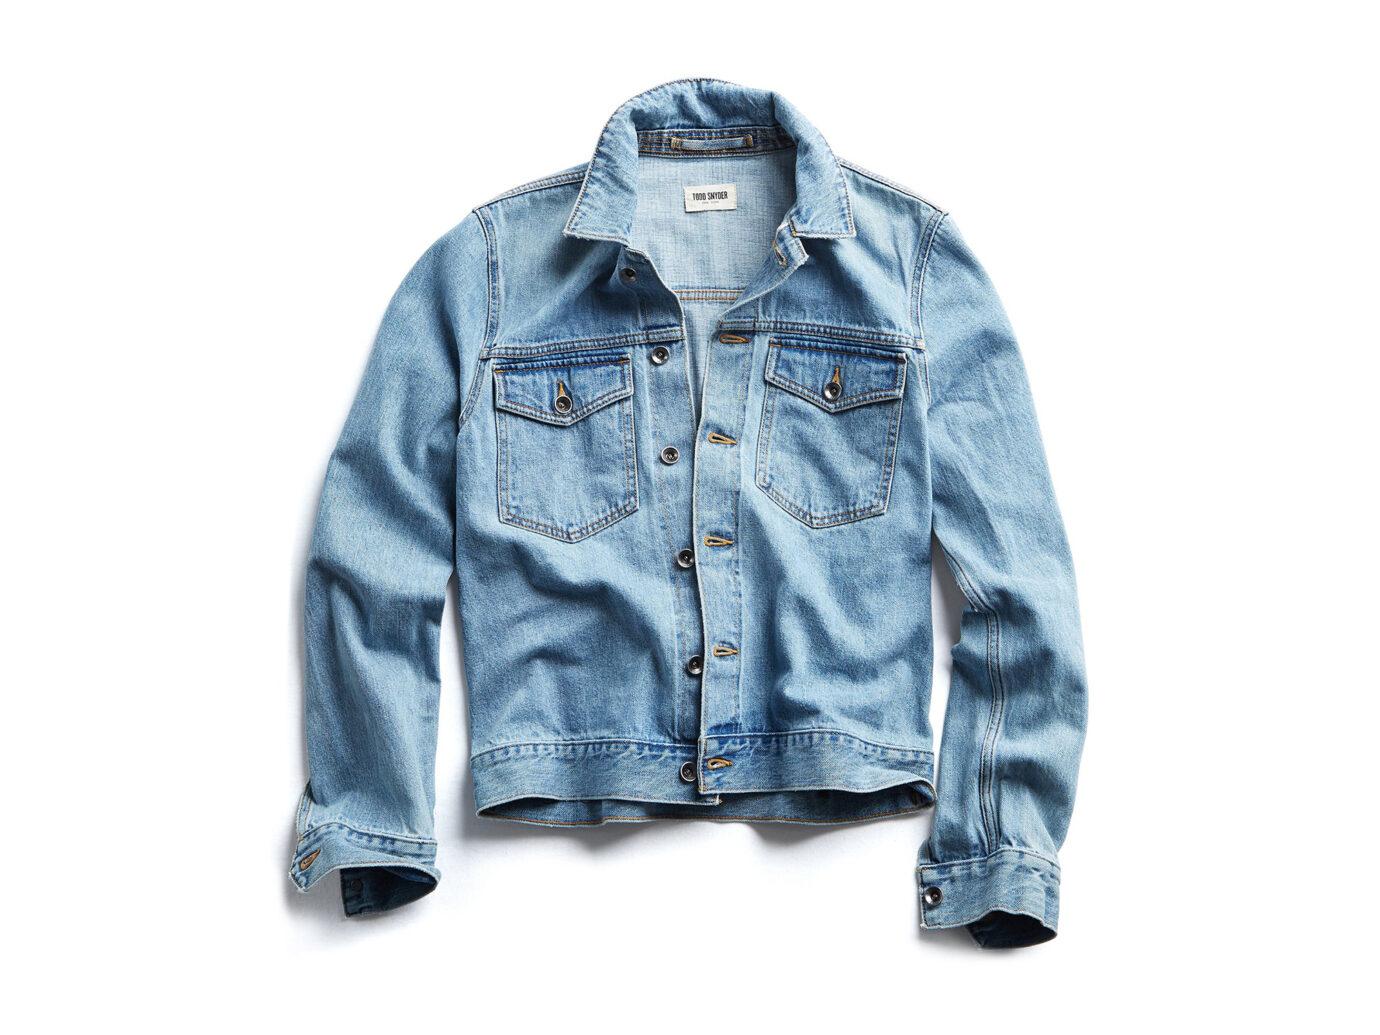 Todd Snyder Japanese Stretch Selvage Denim Jacket